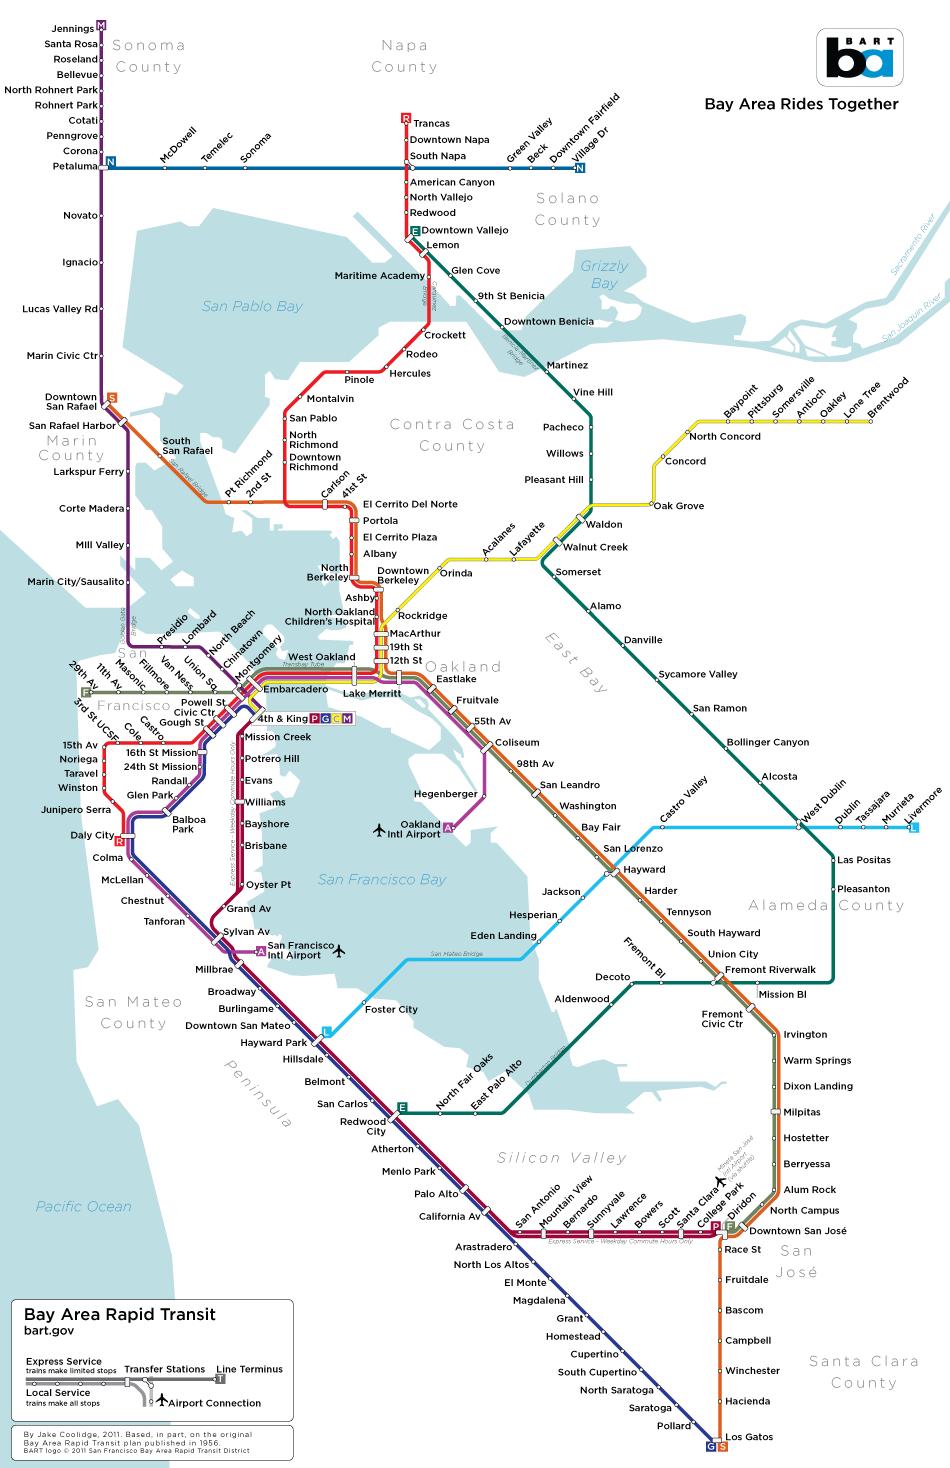 Expanded BART System Map Based On Original Plans Incorporating - Map san francisco mission district